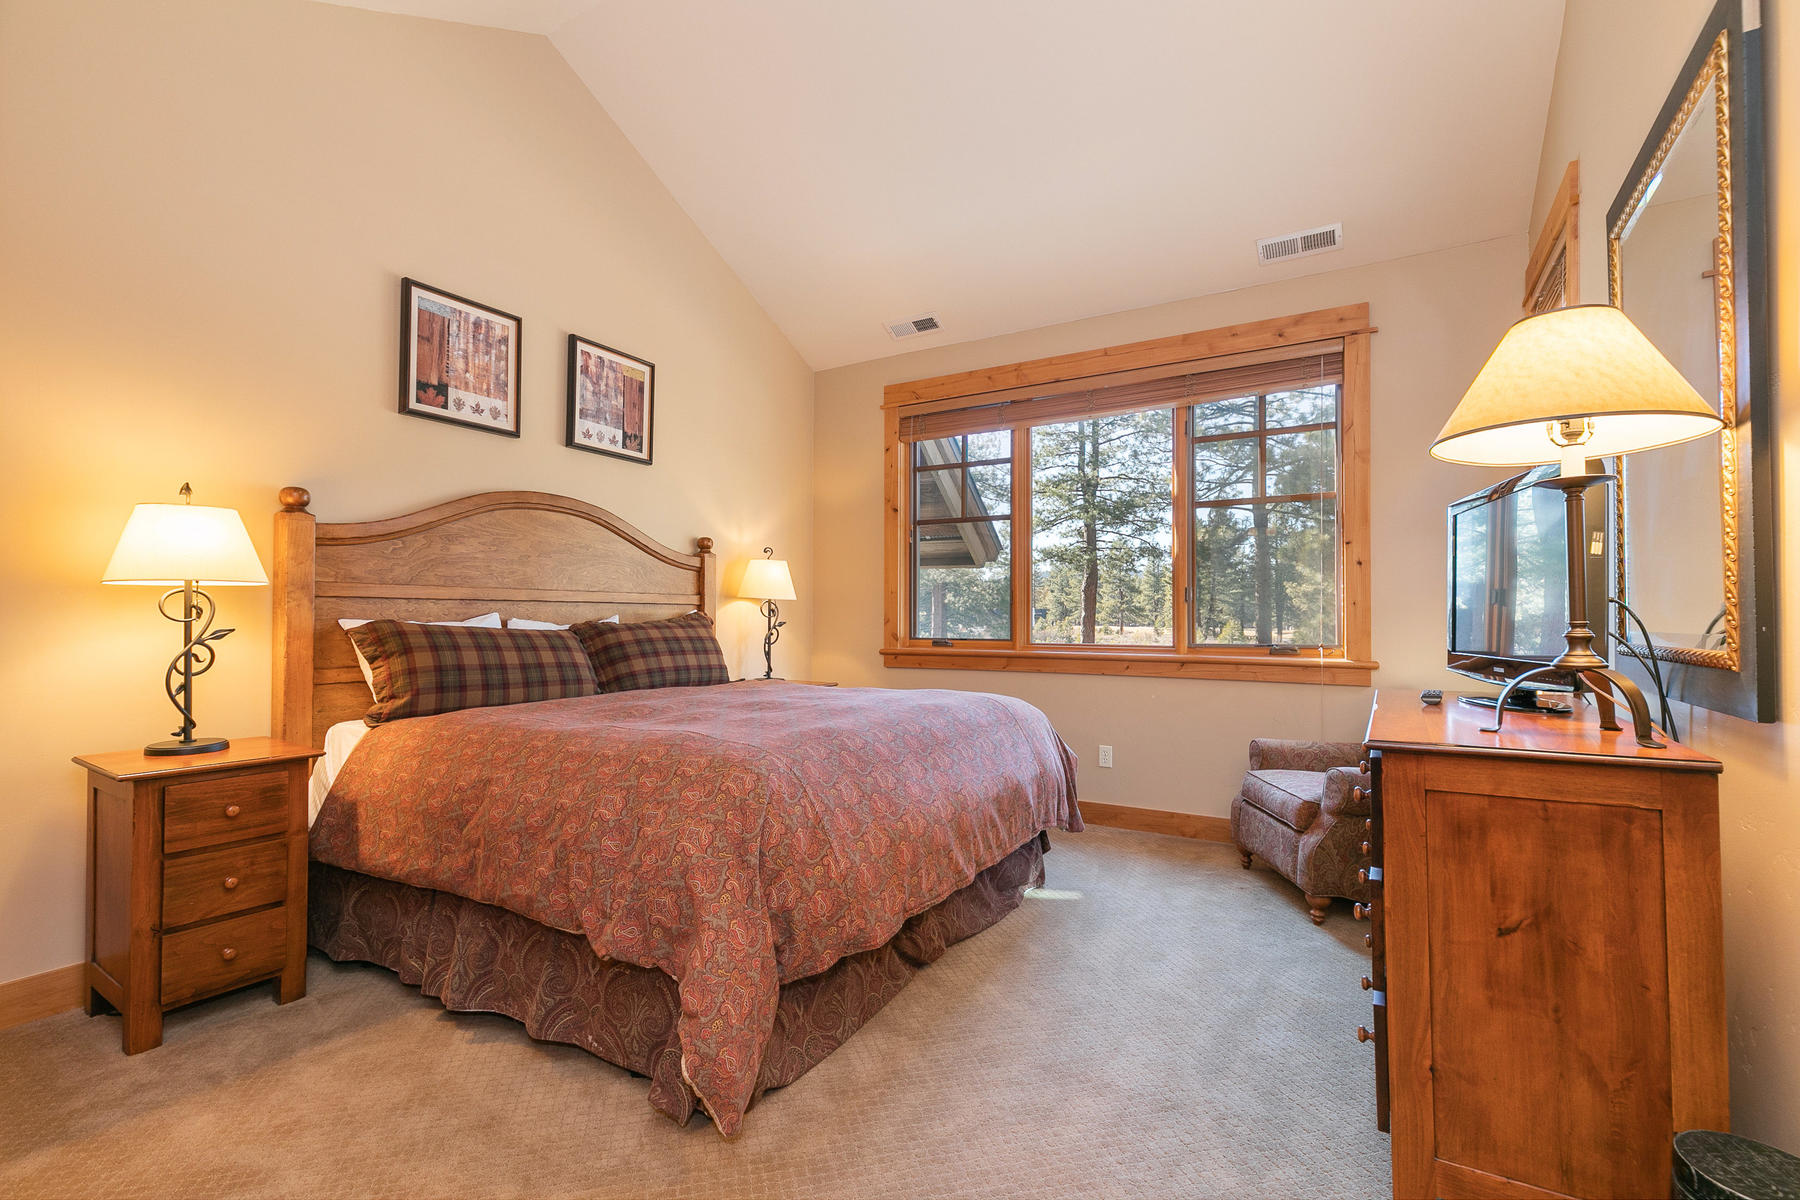 Additional photo for property listing at 13170 Fairway Drive Truckee California 96161 13170 Fairway Drive 特拉基, 加利福尼亚州 96161 美国